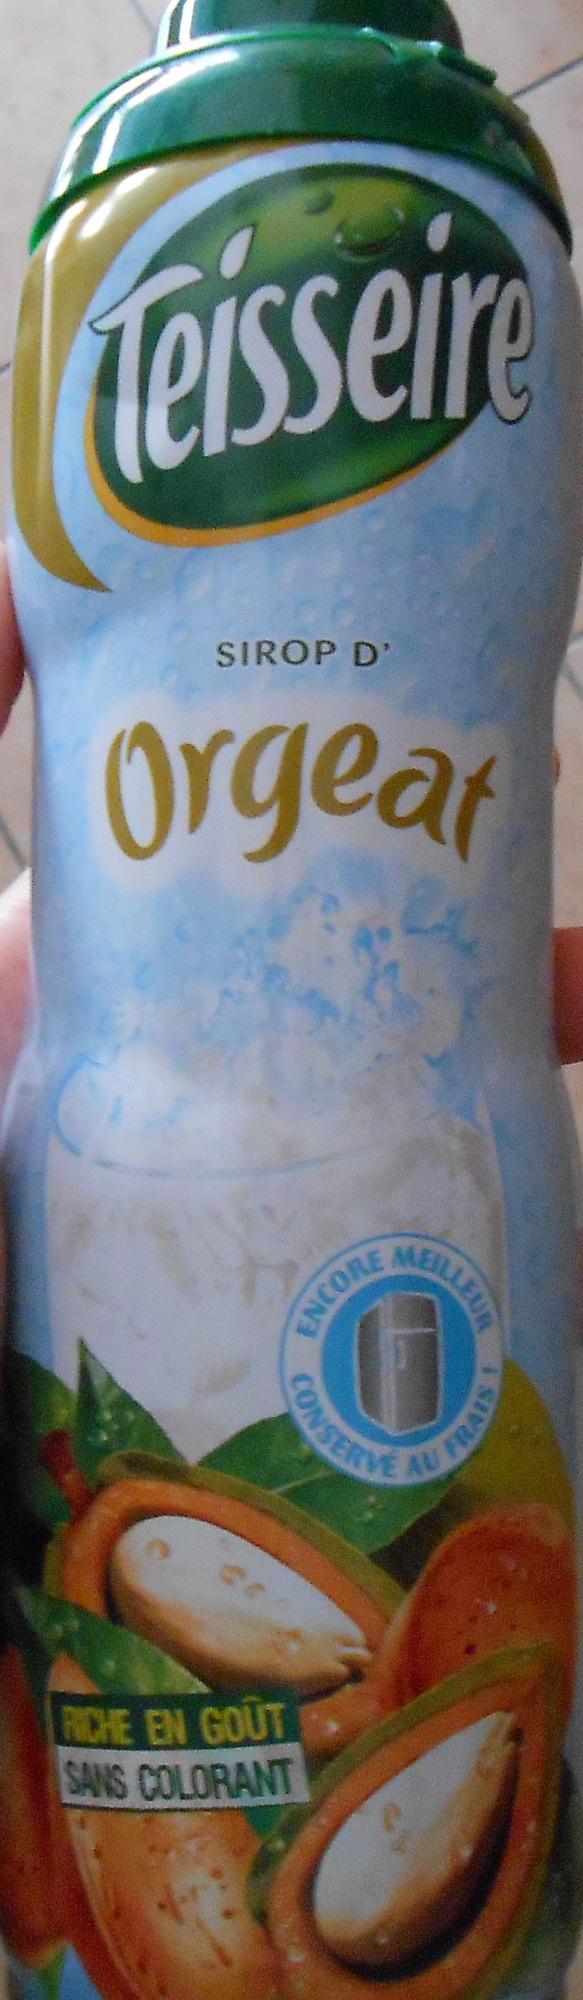 Sirop d'Orgeat - Produit - fr